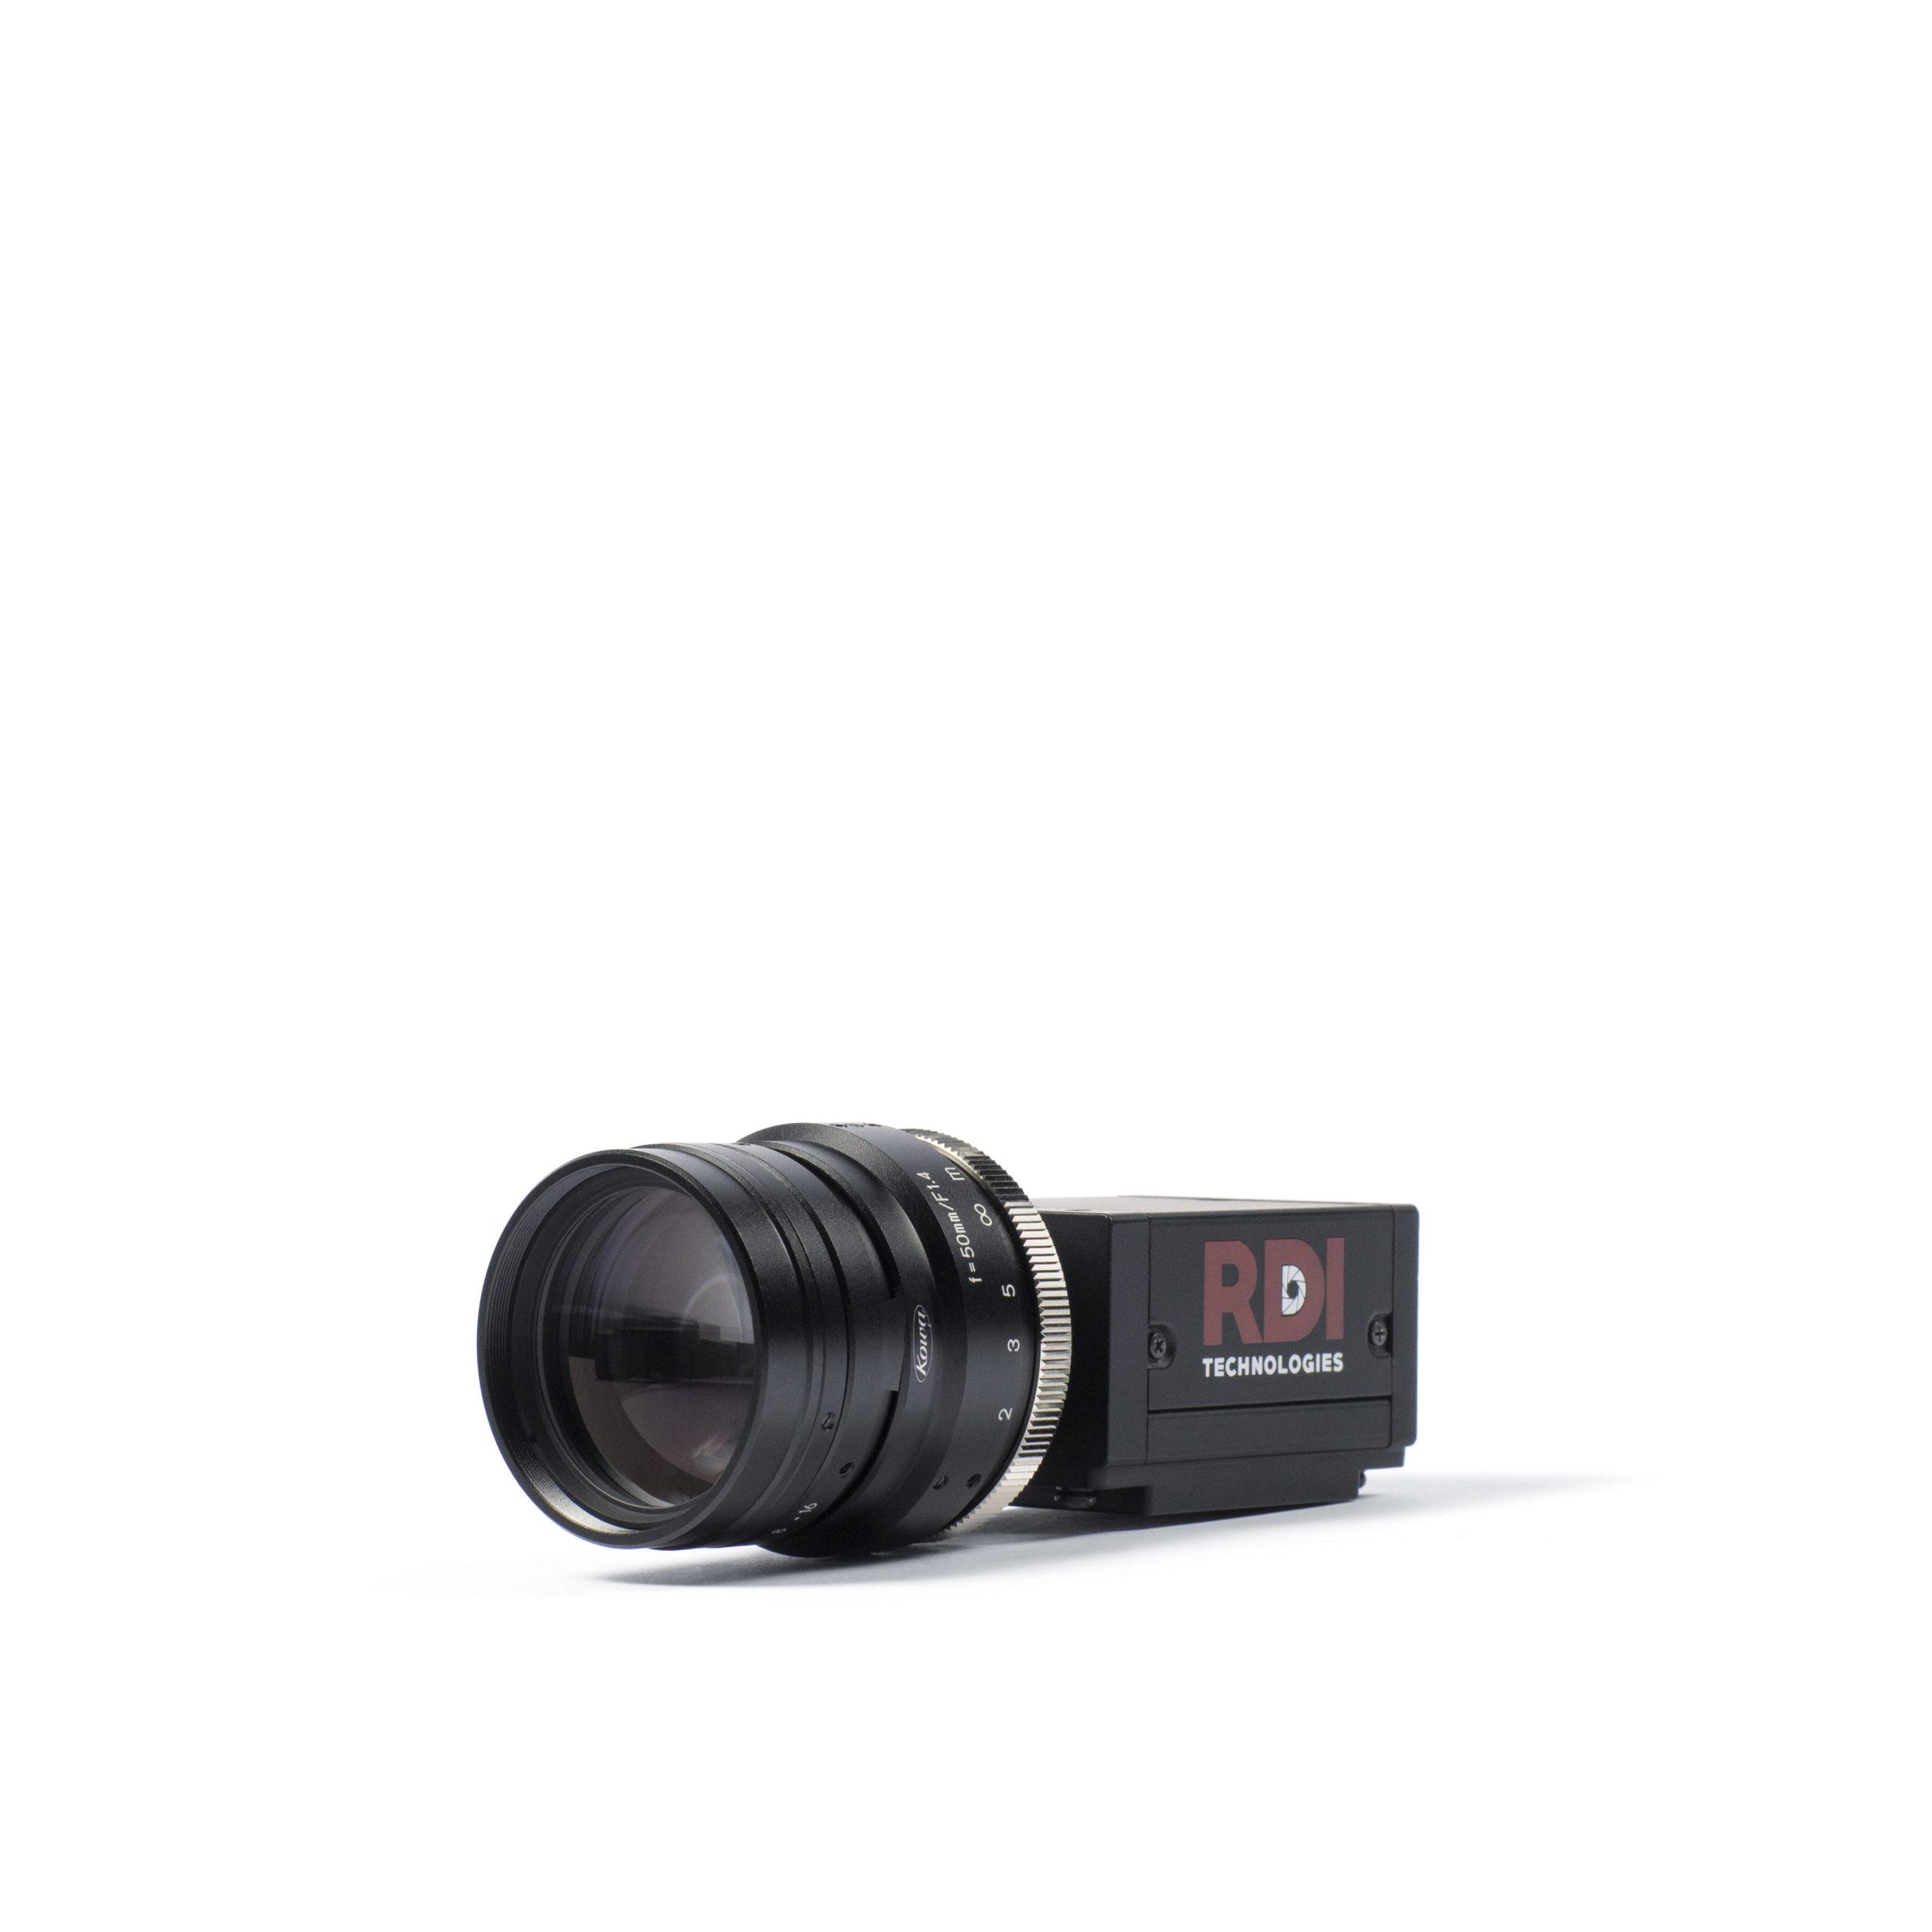 Iris M on ground with lens